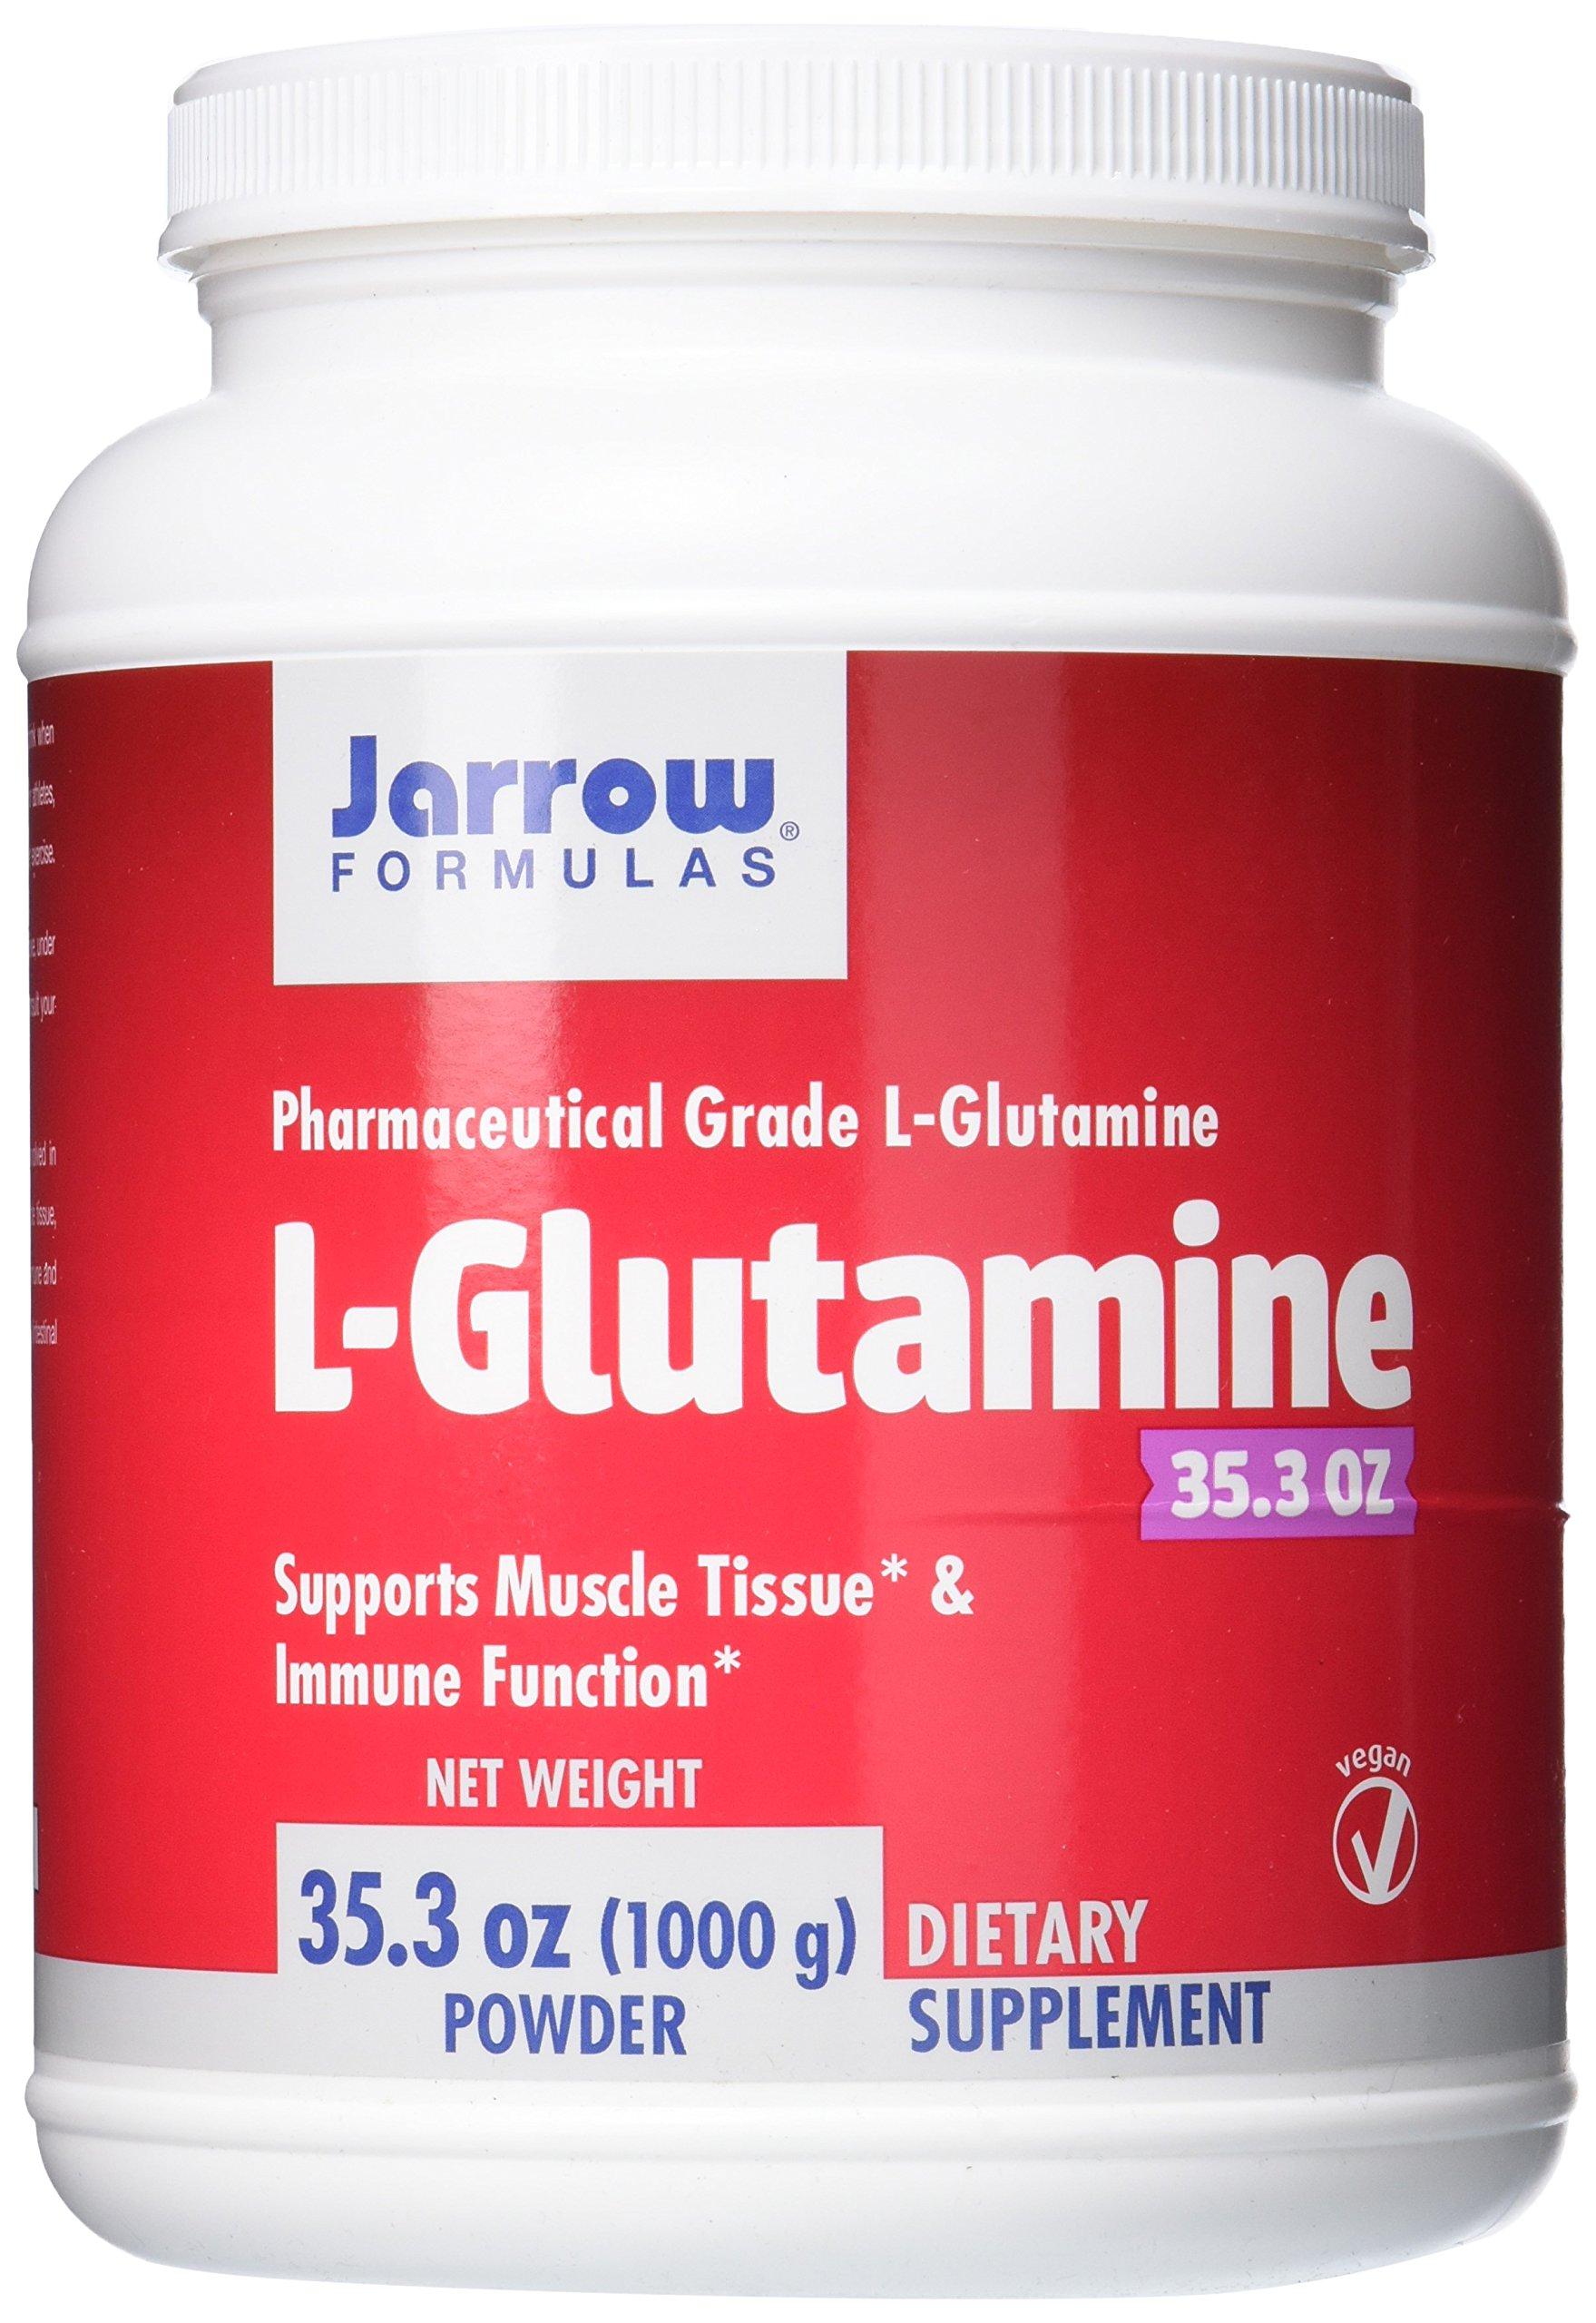 Jarrow Formulas L-Glutamine Powder, Supports Muscle Tissue, 2 g per Serving, 35.3 Oz by Jarrow Formulas